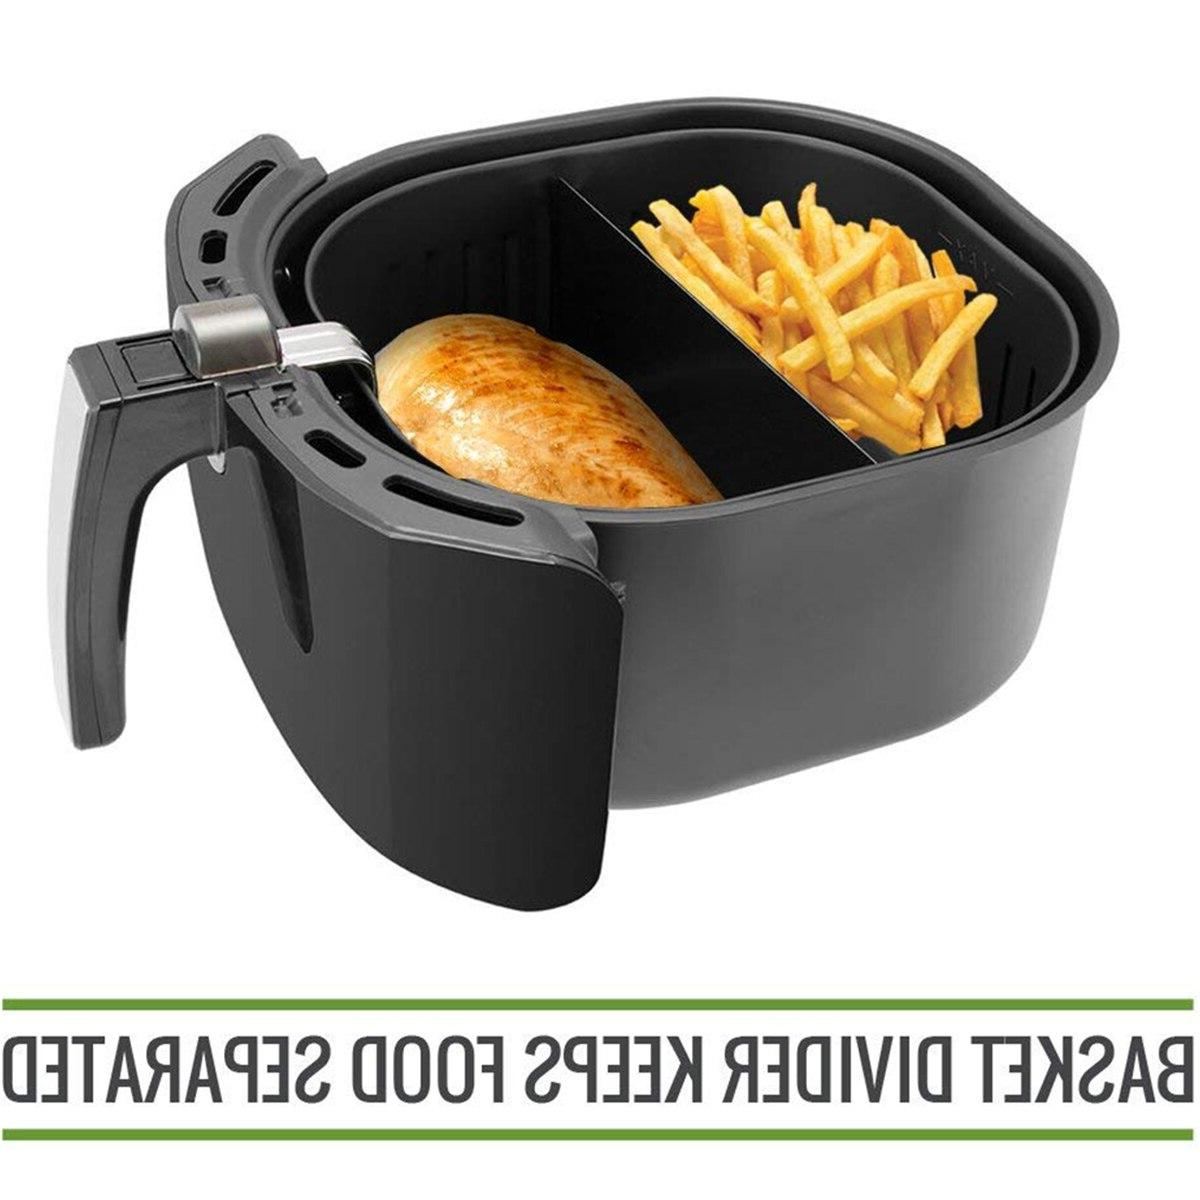 XL <font><b>Air</b></font> <font><b>Fryer</b></font> Cooking